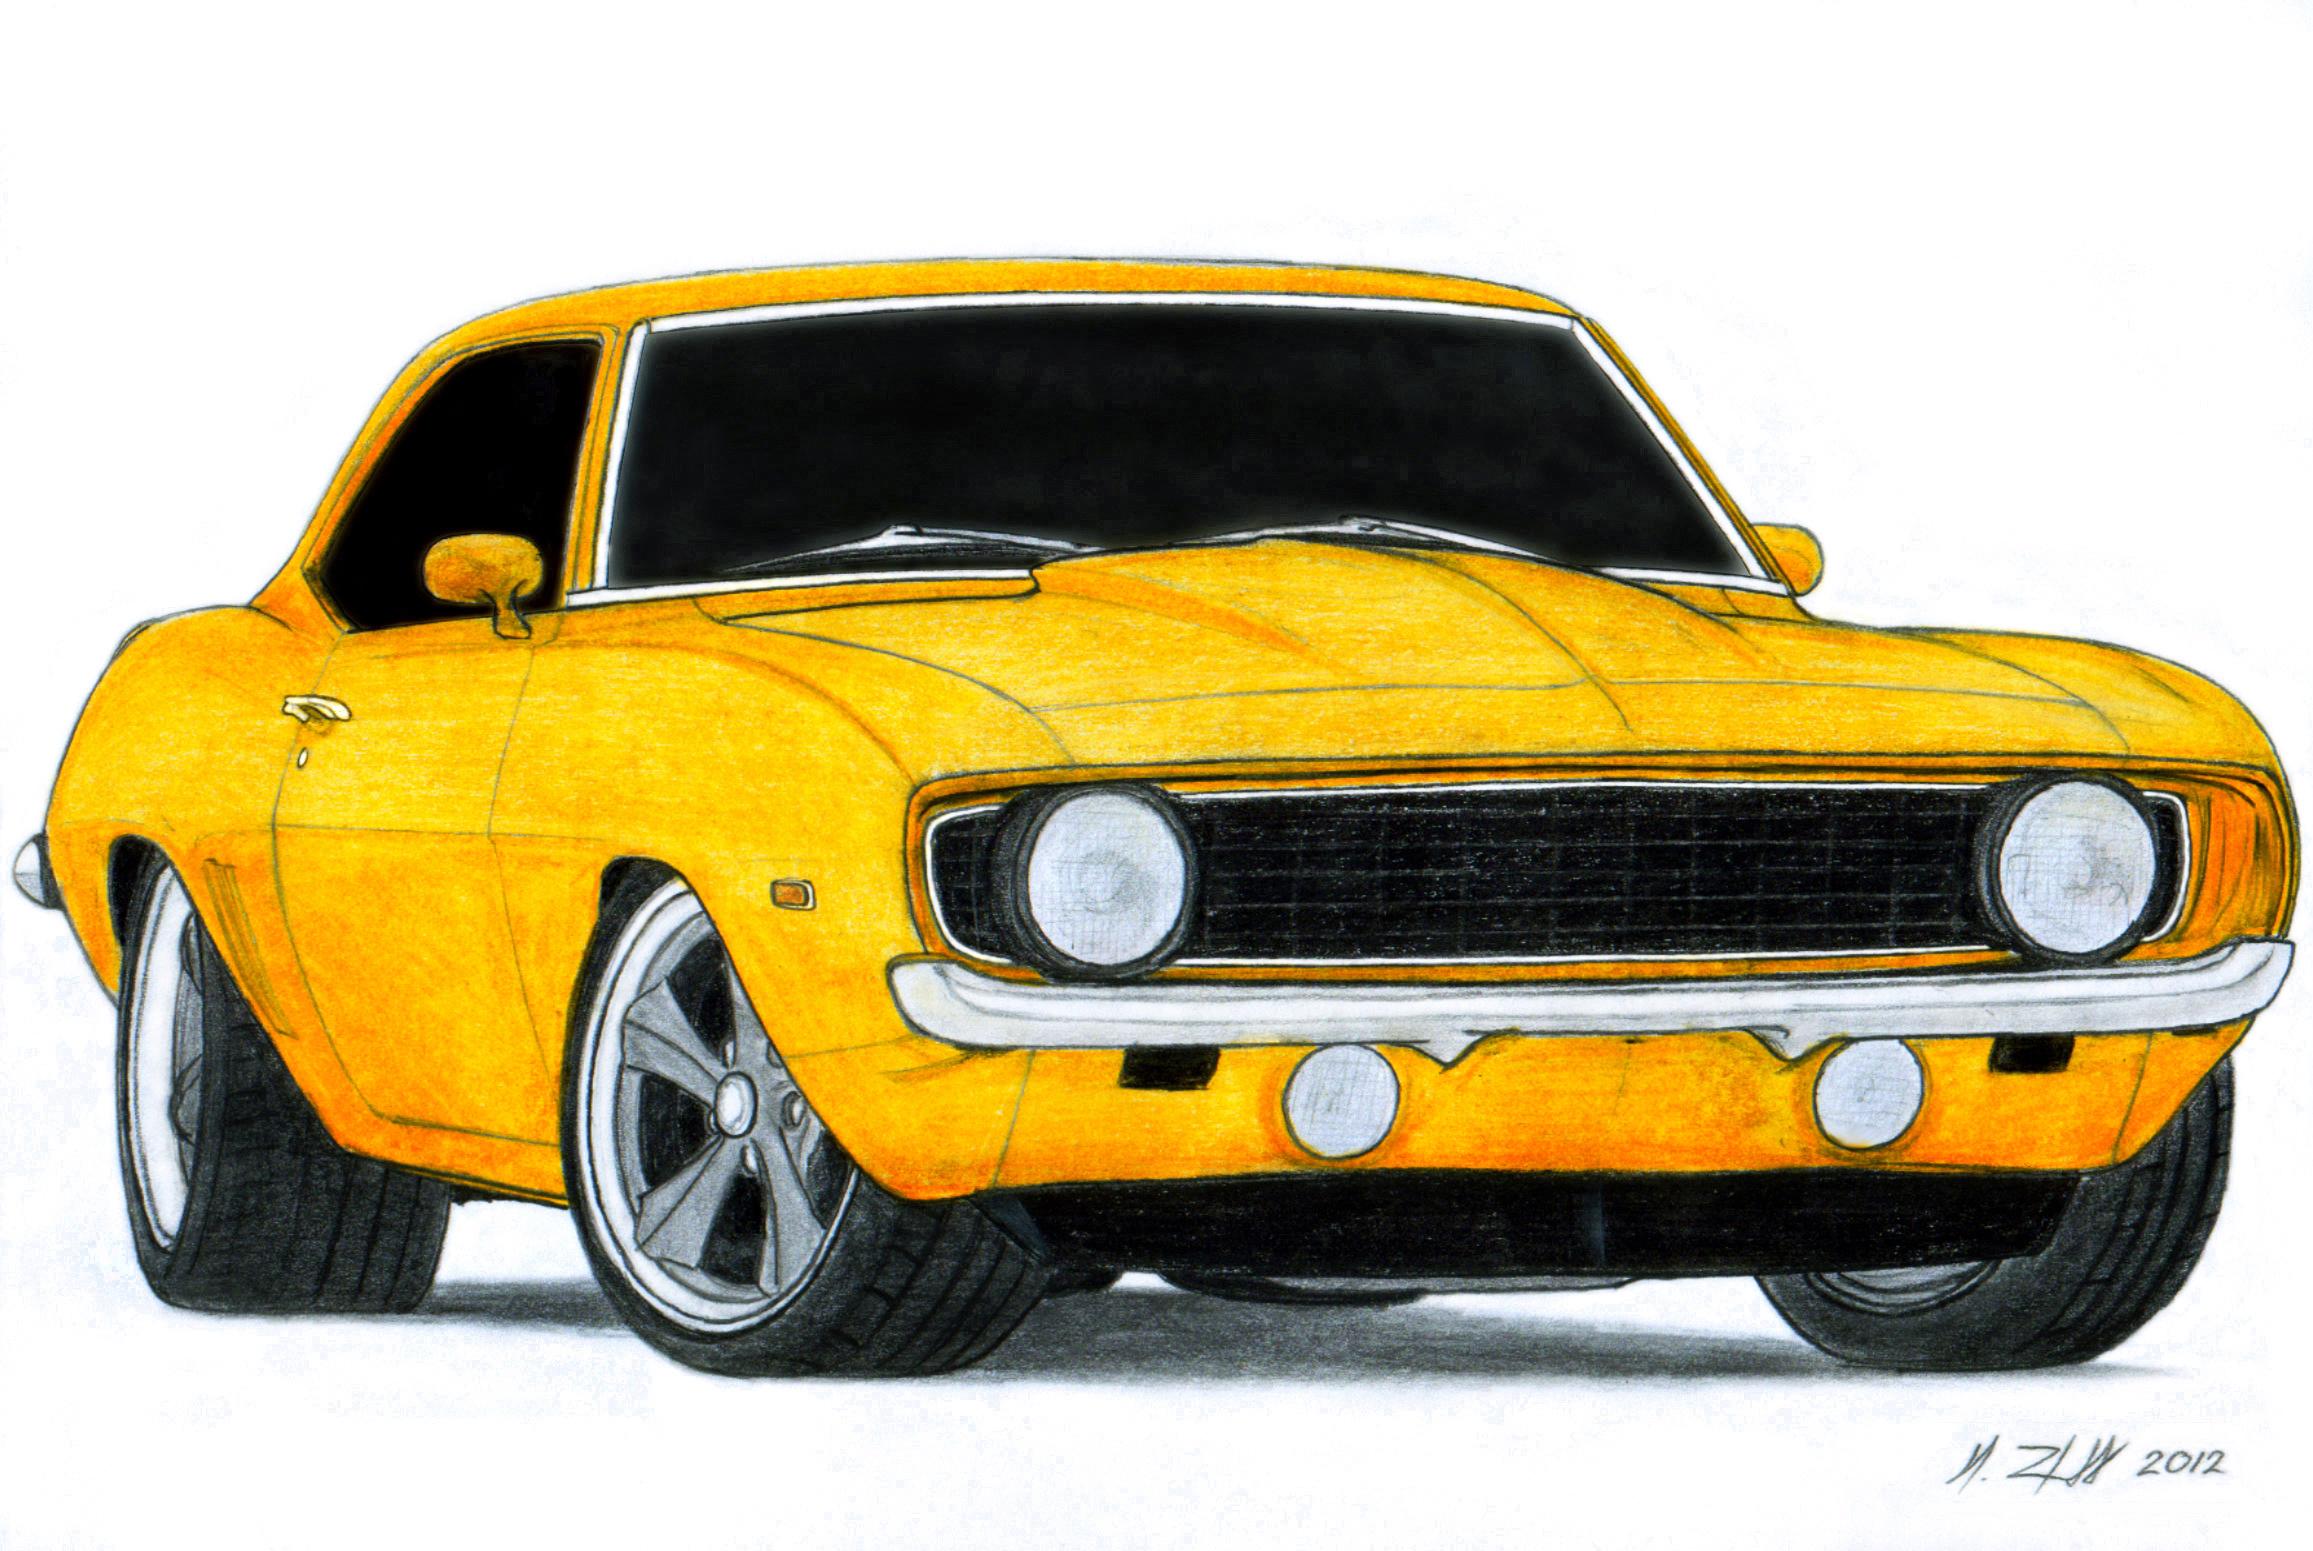 Chevrolet Camaro Drawing at GetDrawings.com.